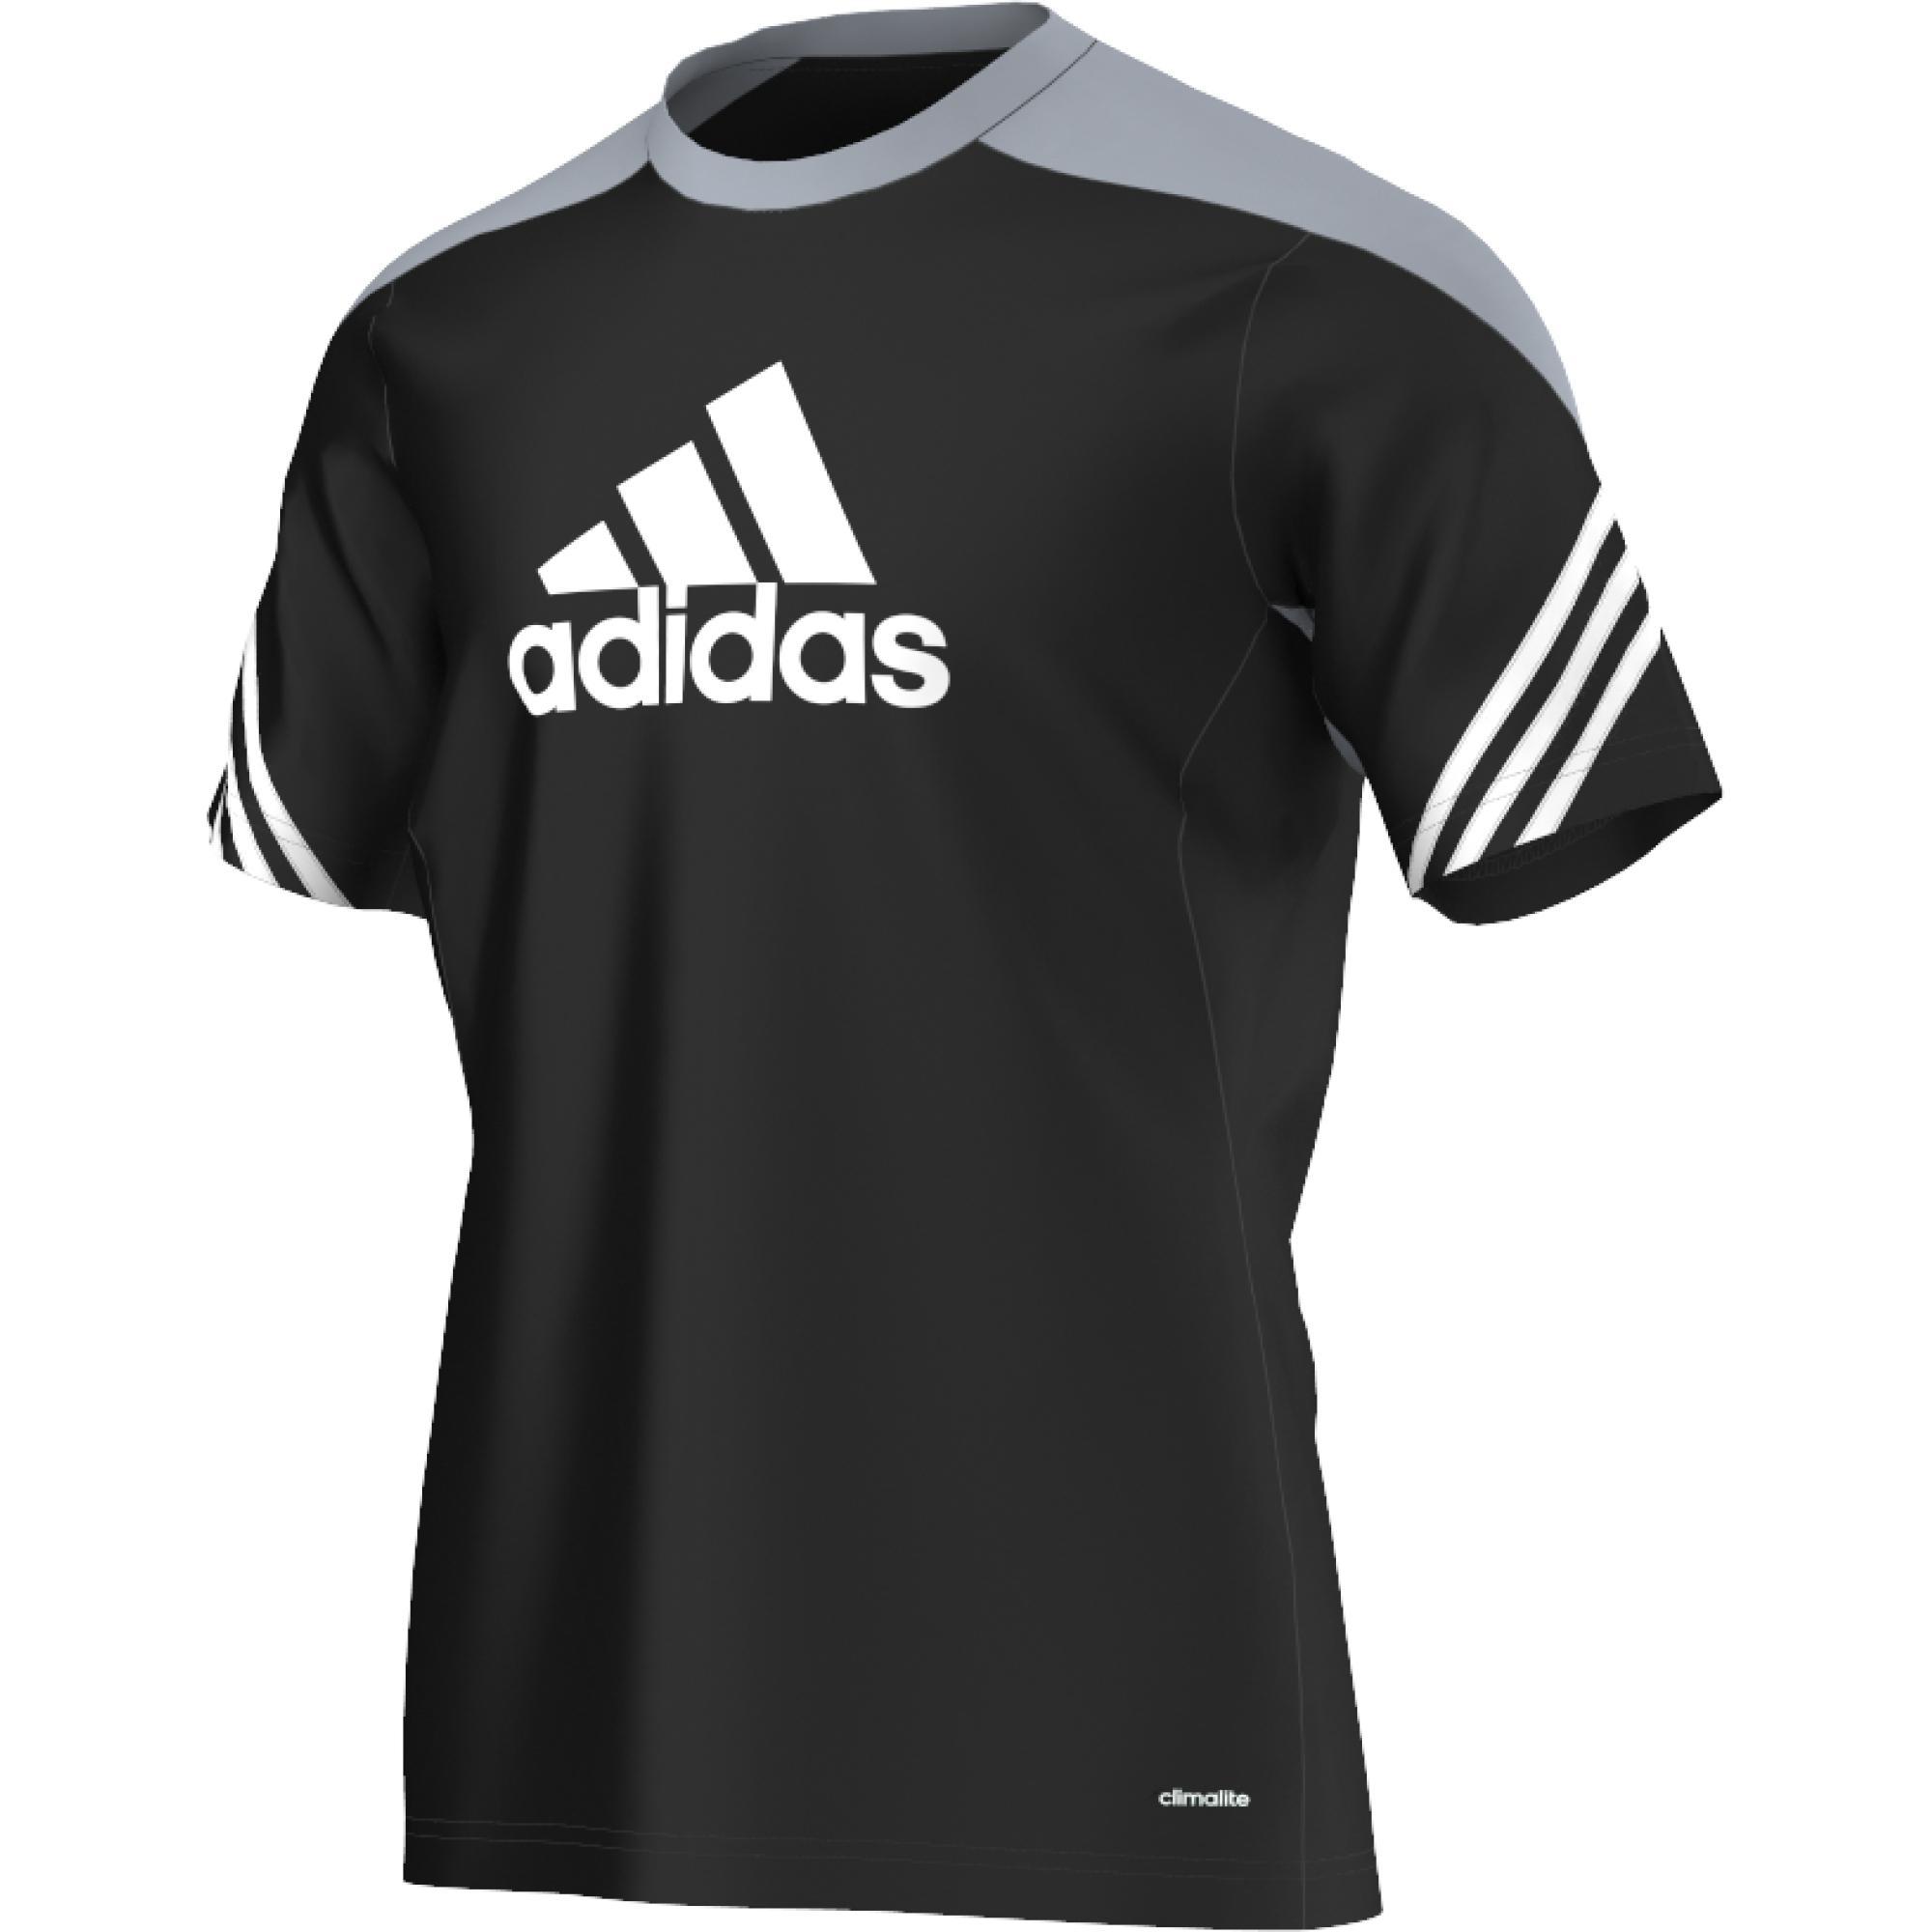 VÝPREDAJ ADIDAS tričko Sereno 14 TRAINING JERSEY caec00ace24